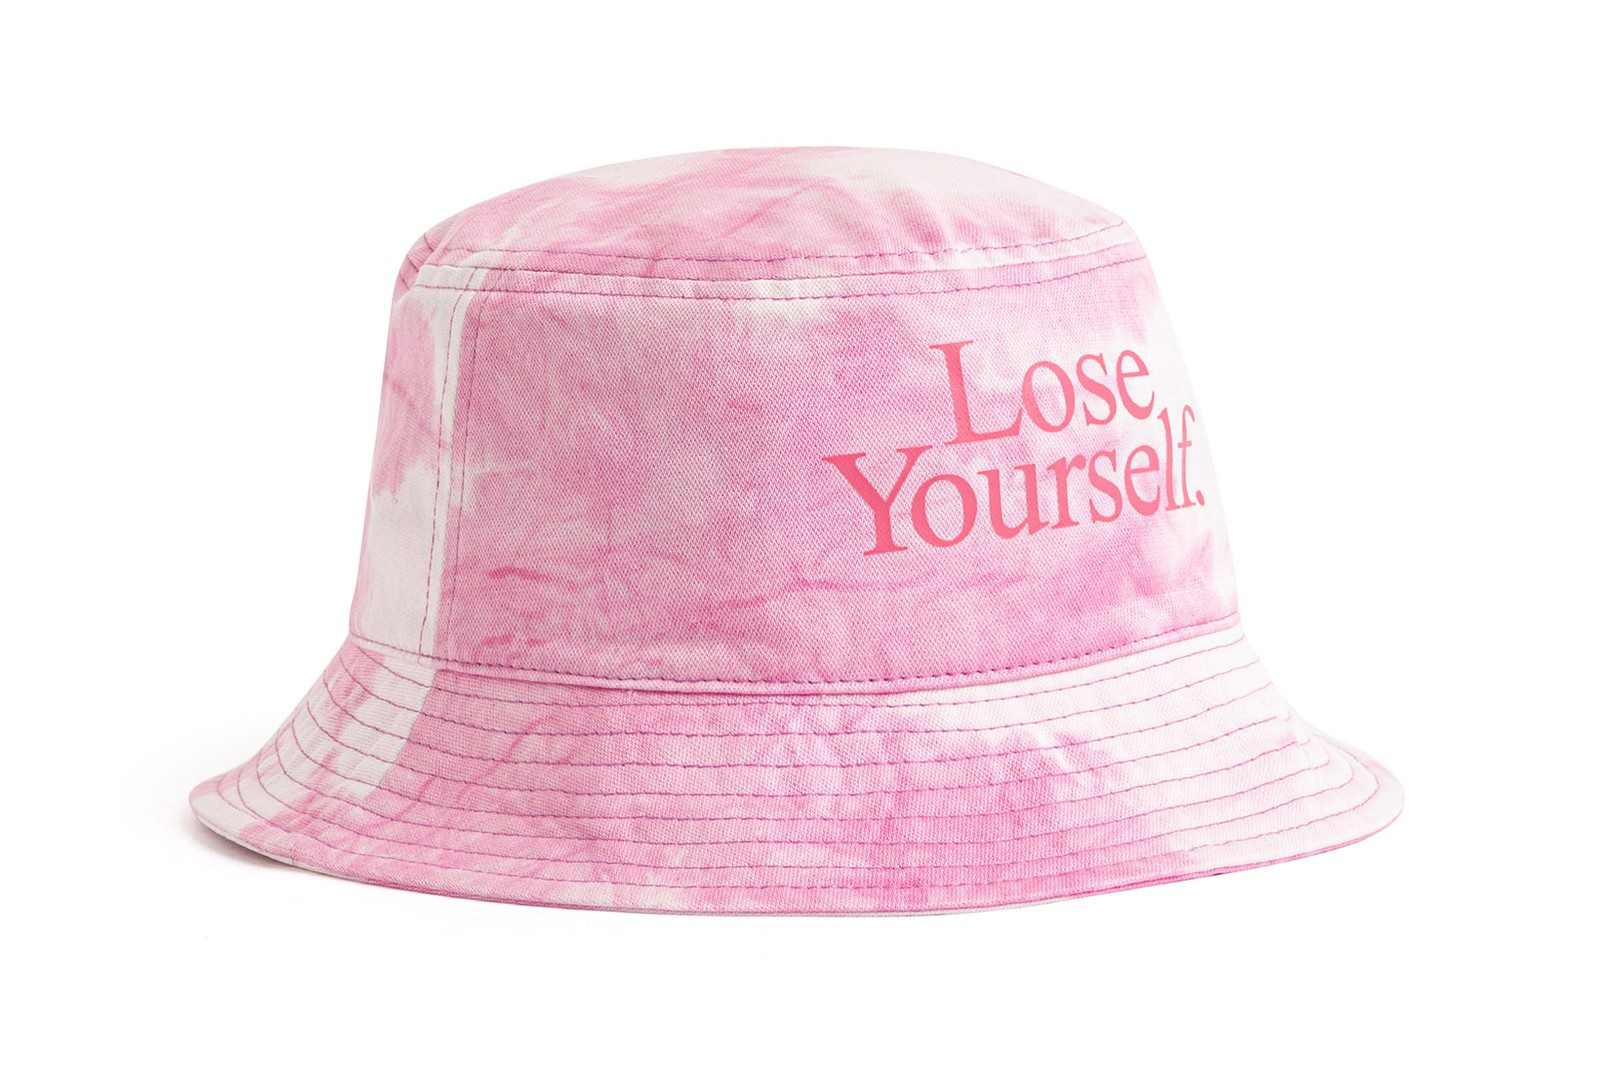 paco rabanne lose yourself tie-dye bucket hats socks hoodies accessories release